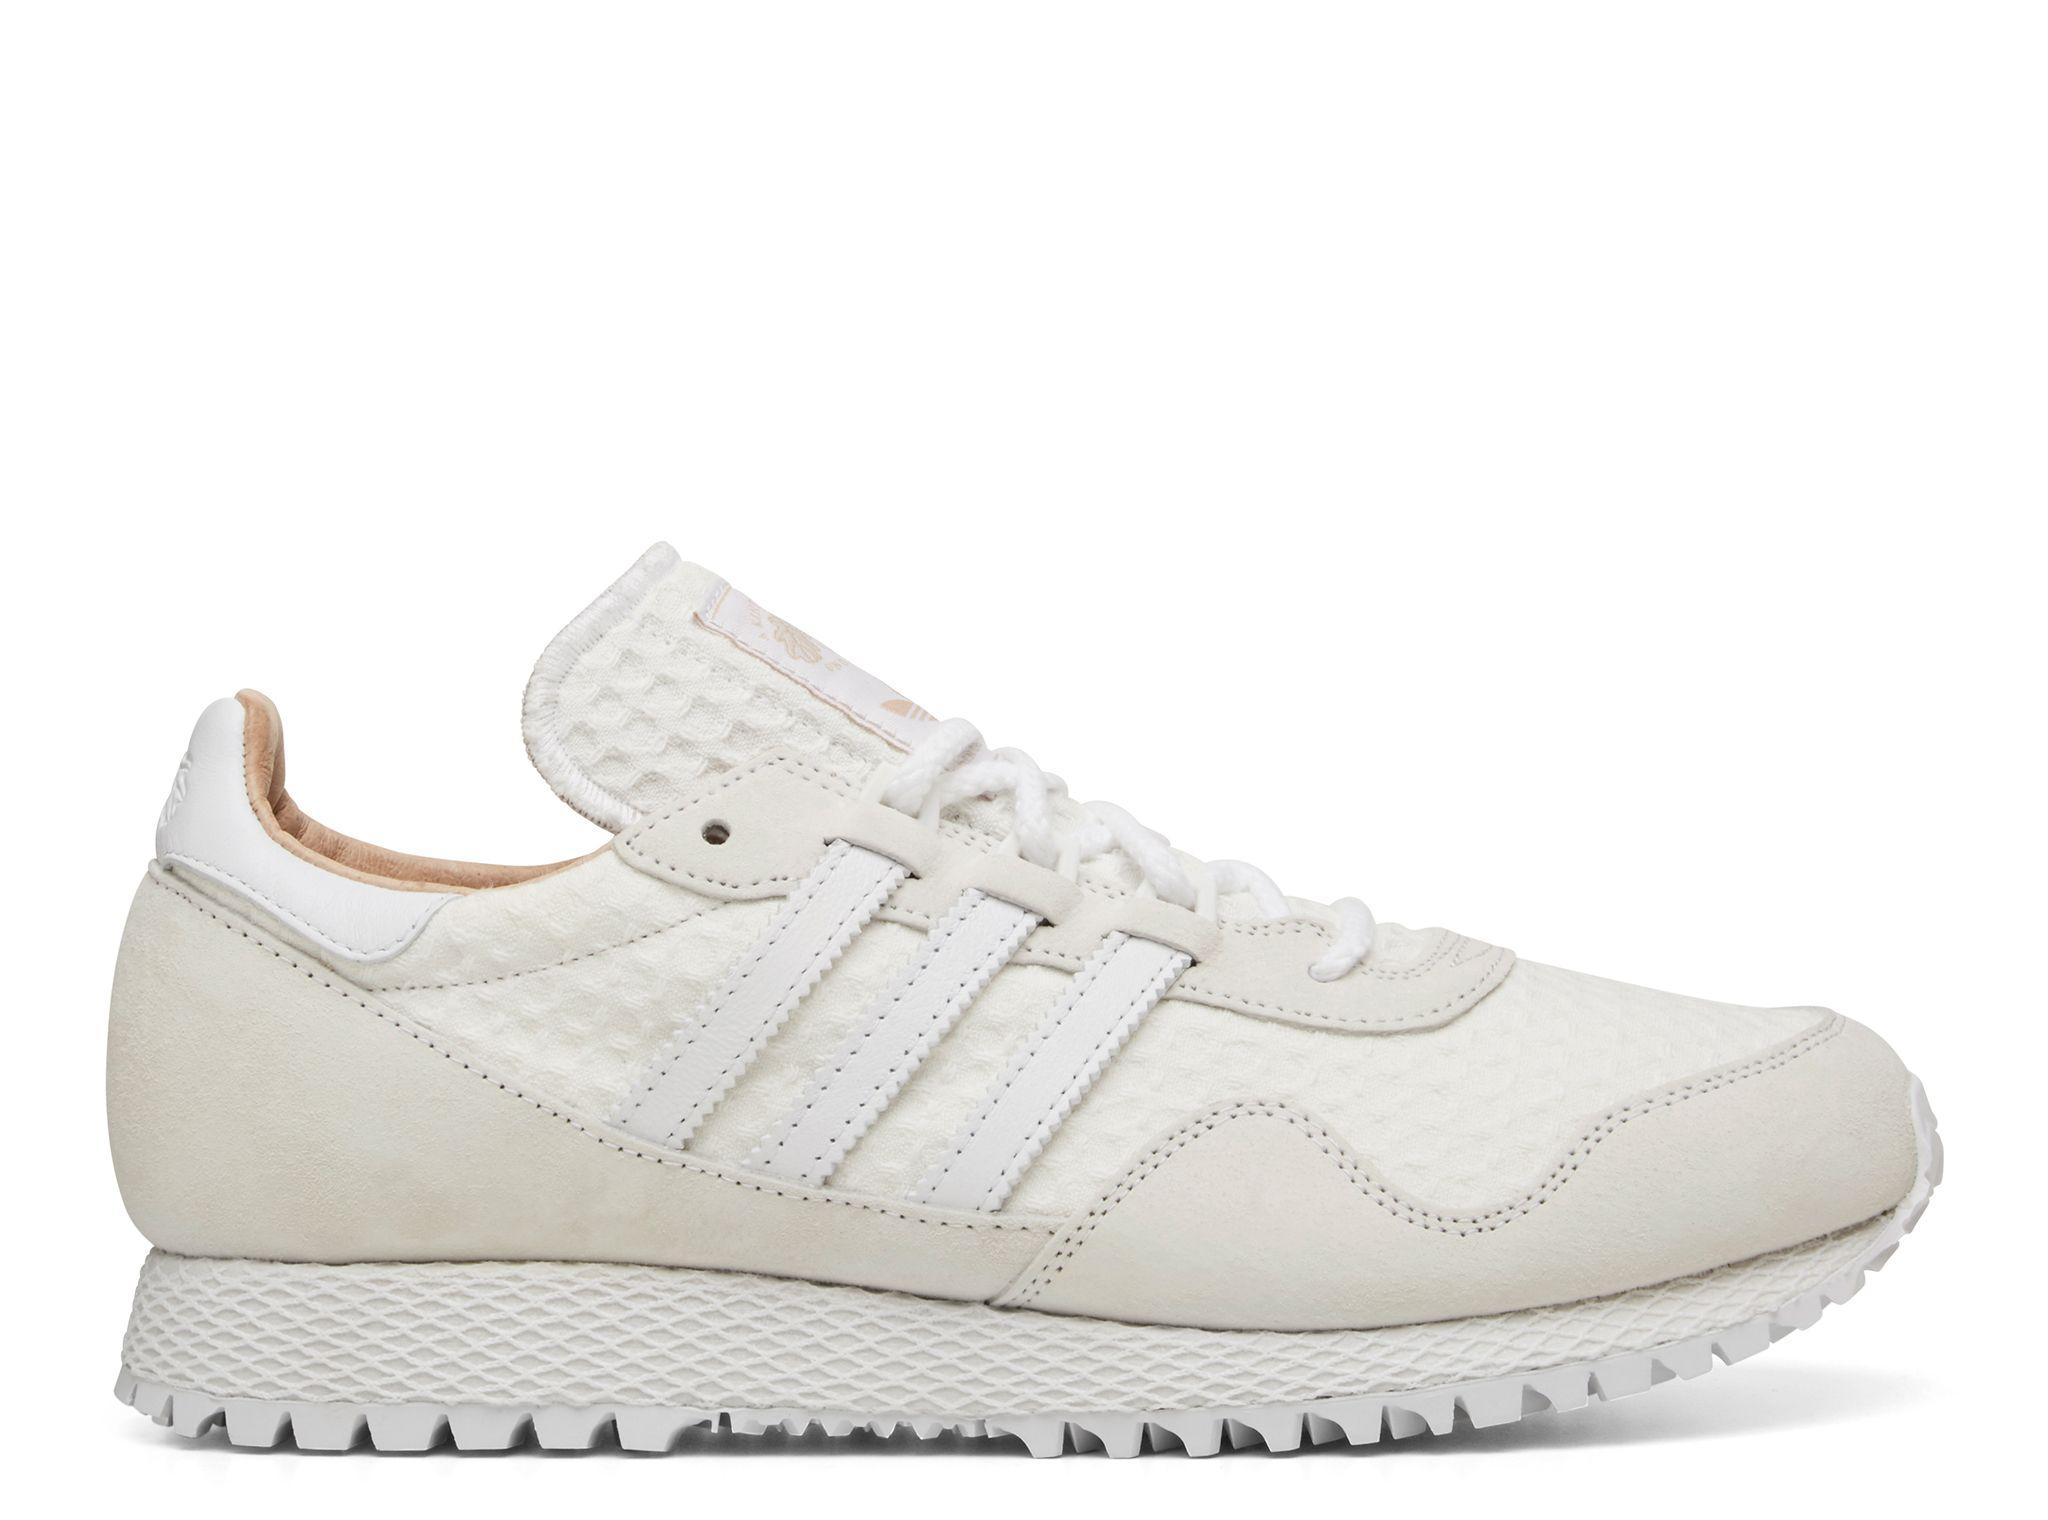 3099ee33862 Adidas Consortium x AKOG Adidas New York Trainer - Sneakerboy ...